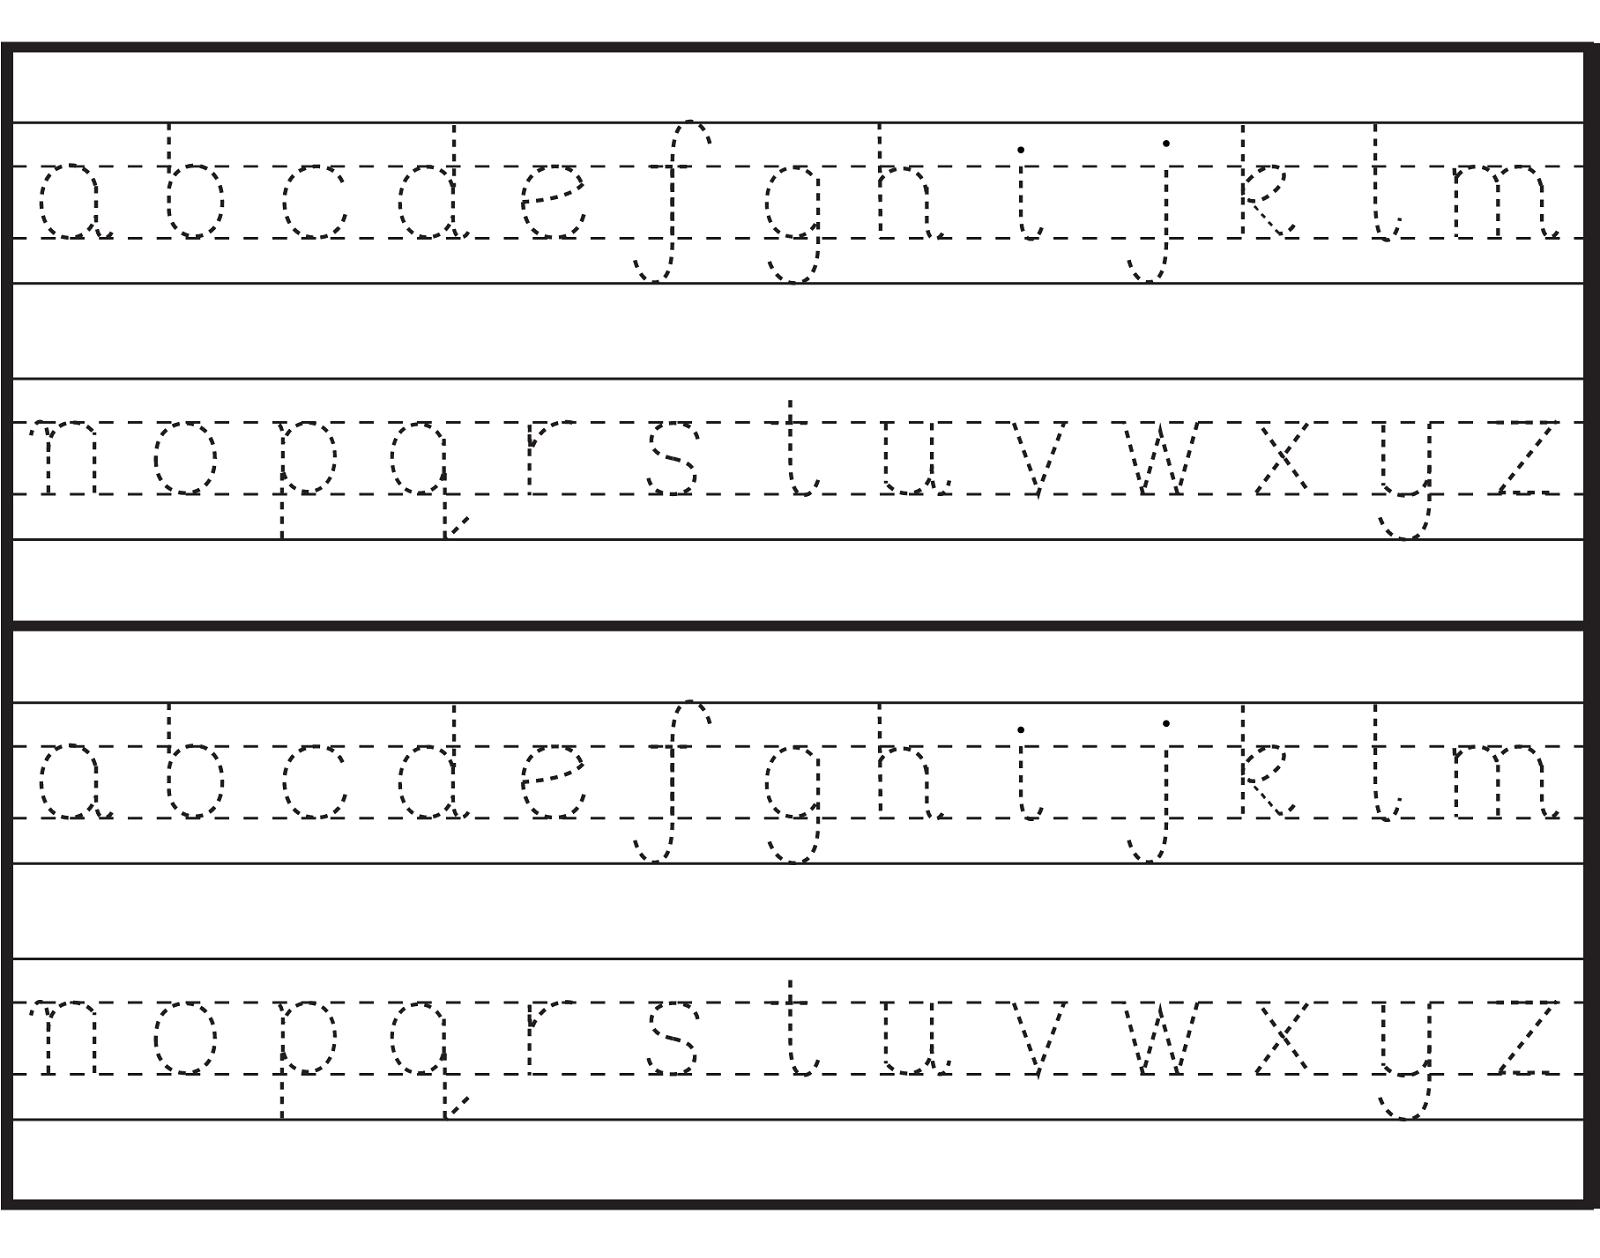 tracing uppercase letters worksheet preschool tracing best free printable worksheets. Black Bedroom Furniture Sets. Home Design Ideas